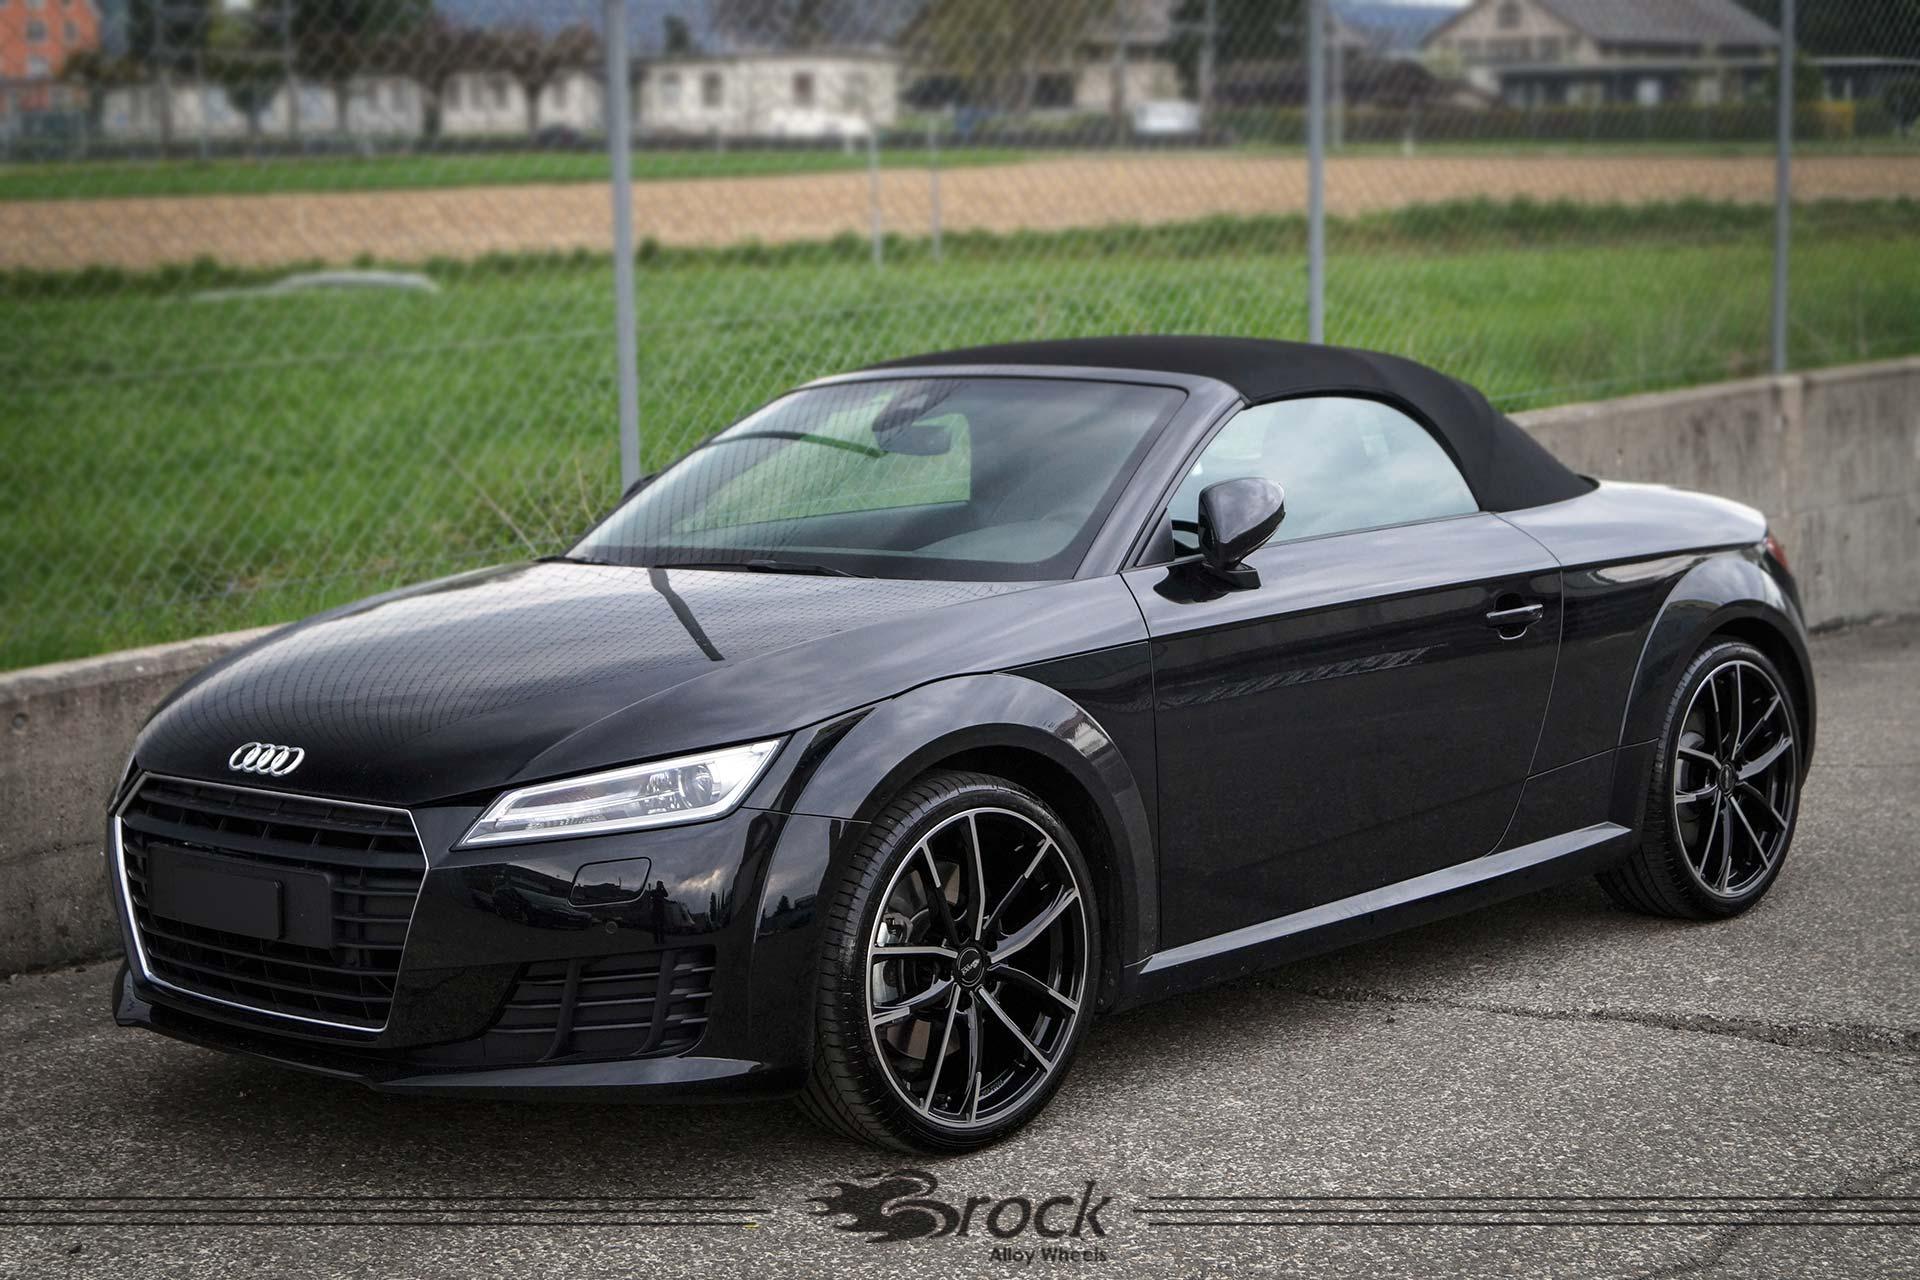 Audi TT 8S Brock B38 SGVP